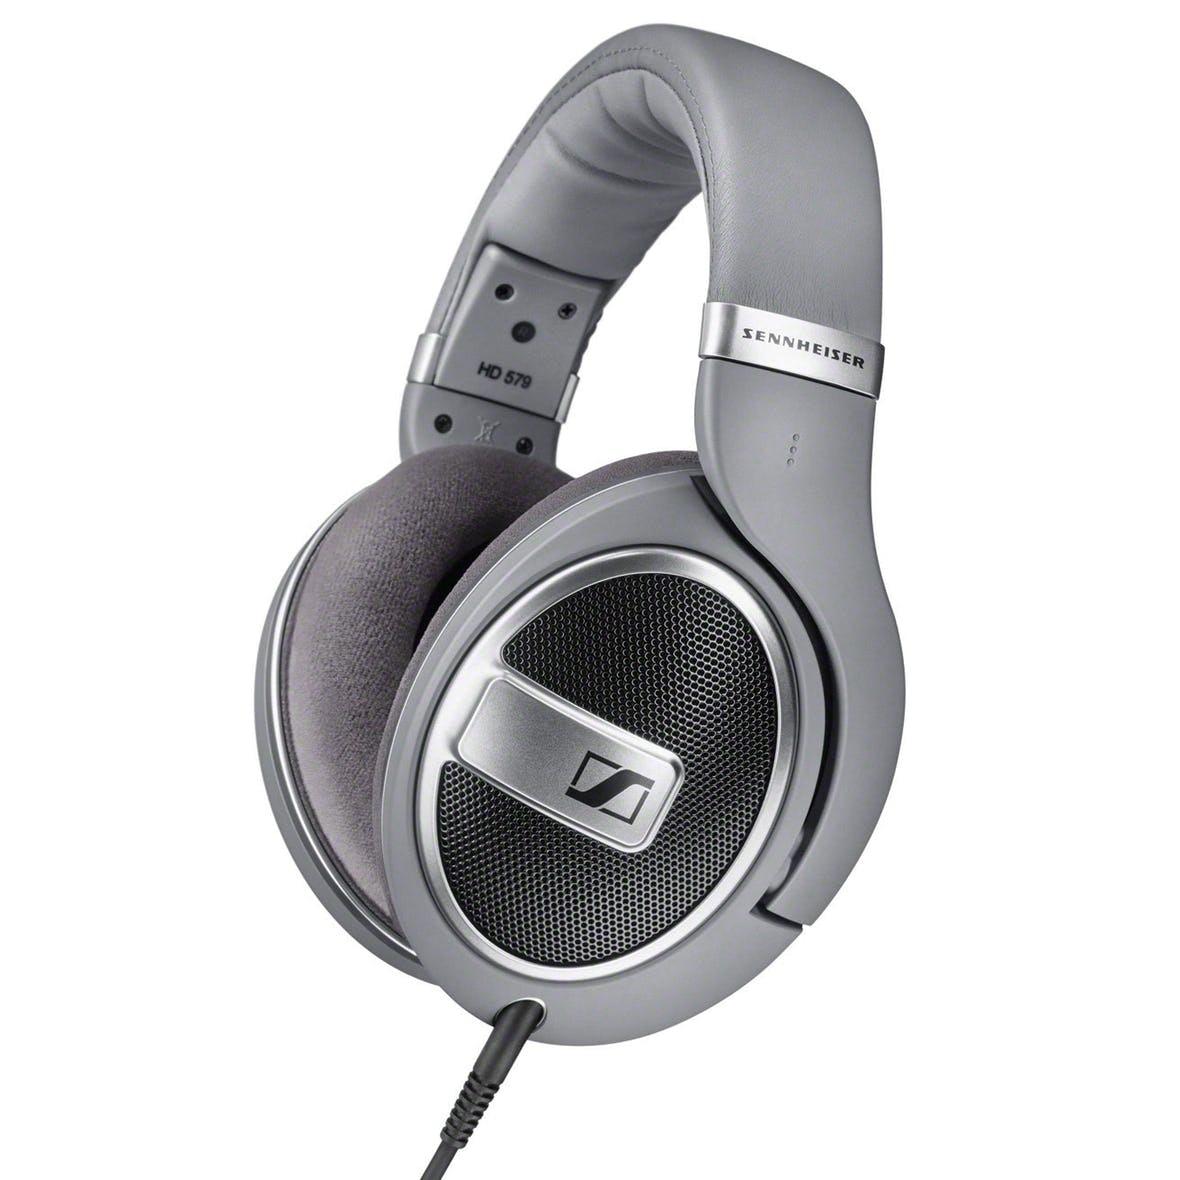 sennheiser headphones huckberry